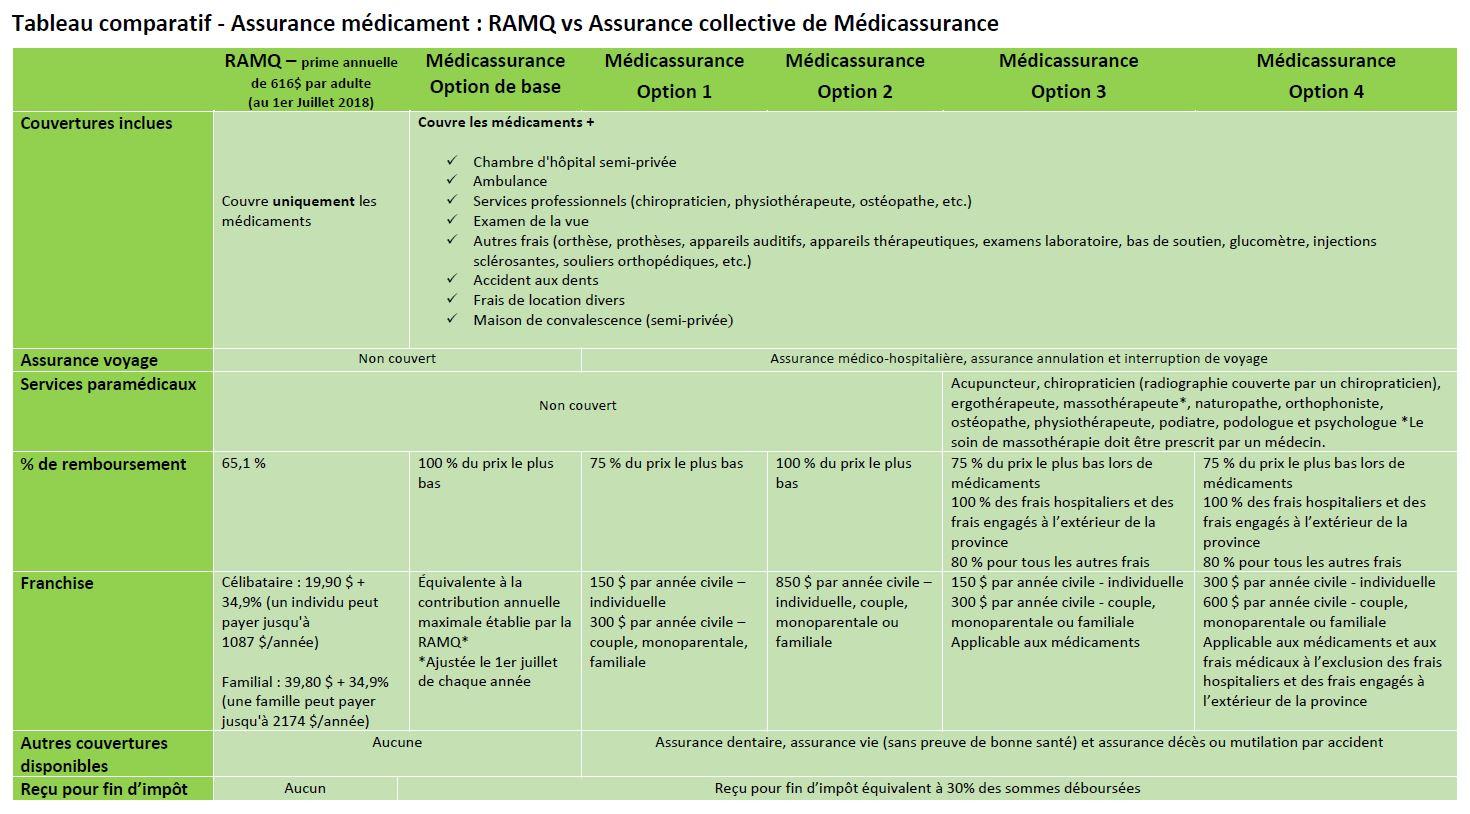 Tableau comparatif RAMQ Médicassurance